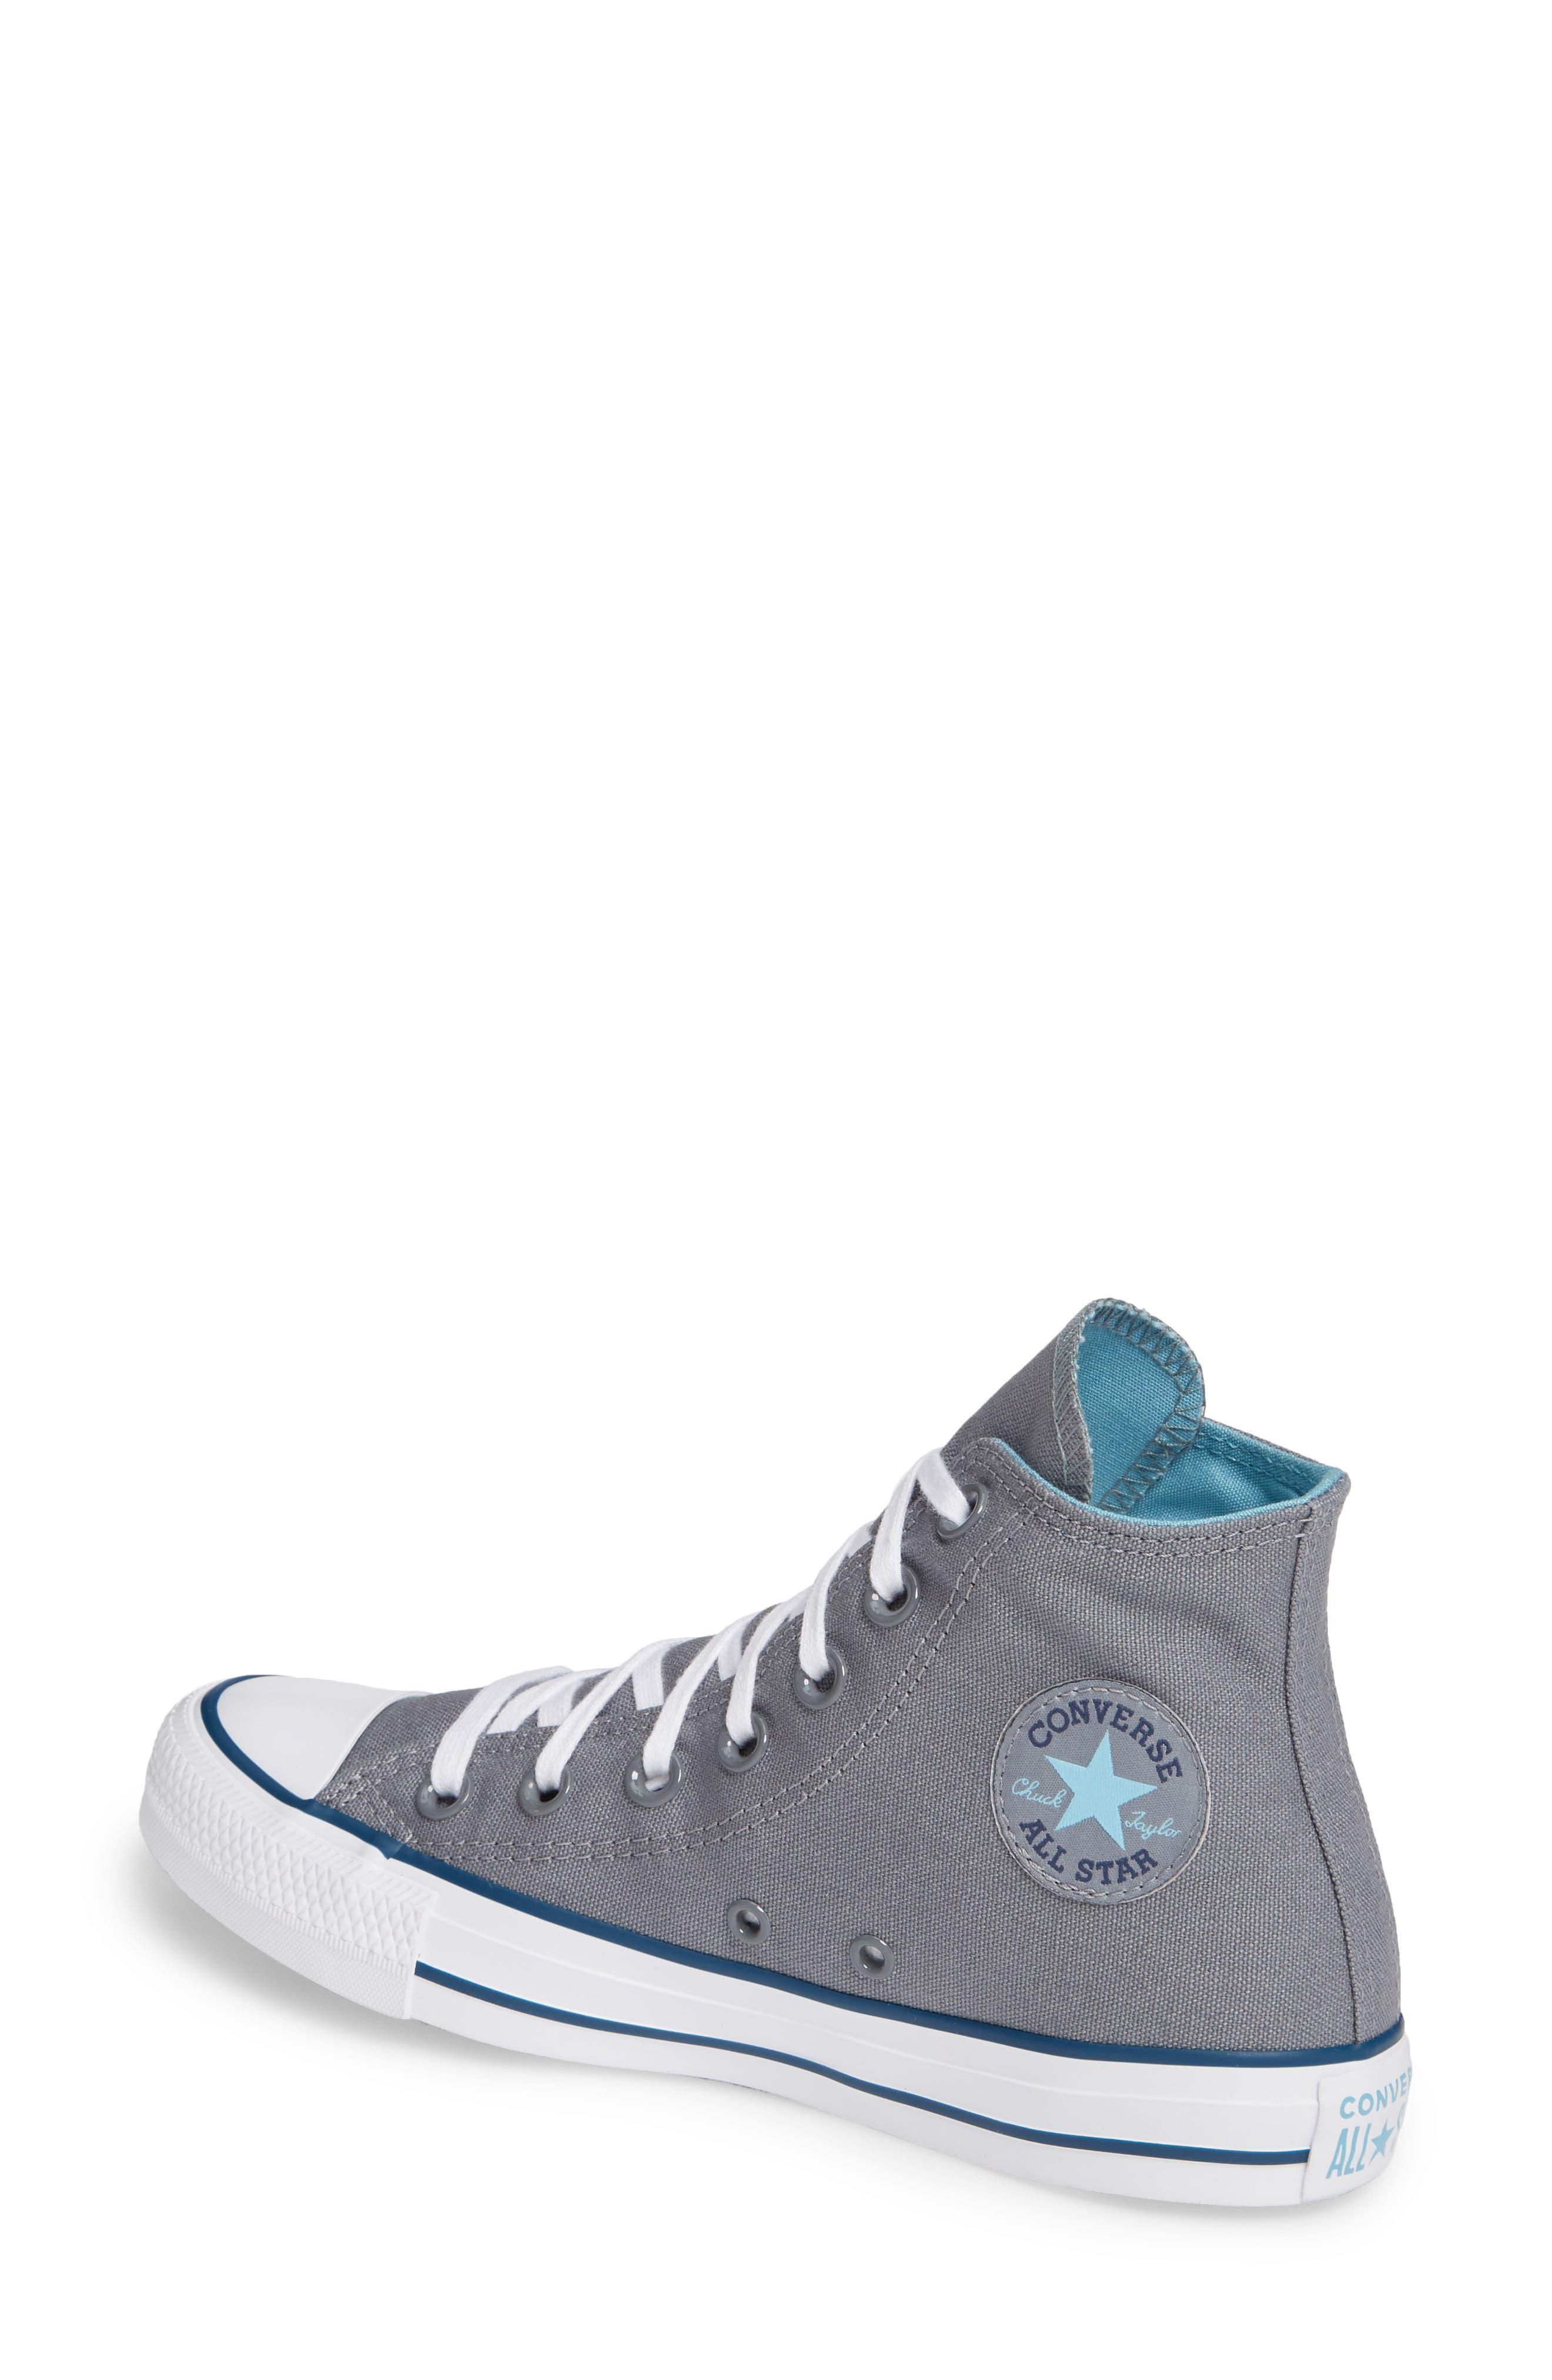 CONVERSE, Chuck Taylor<sup>®</sup> All Star<sup>®</sup> Seasonal Hi Sneaker, Alternate thumbnail 2, color, 039